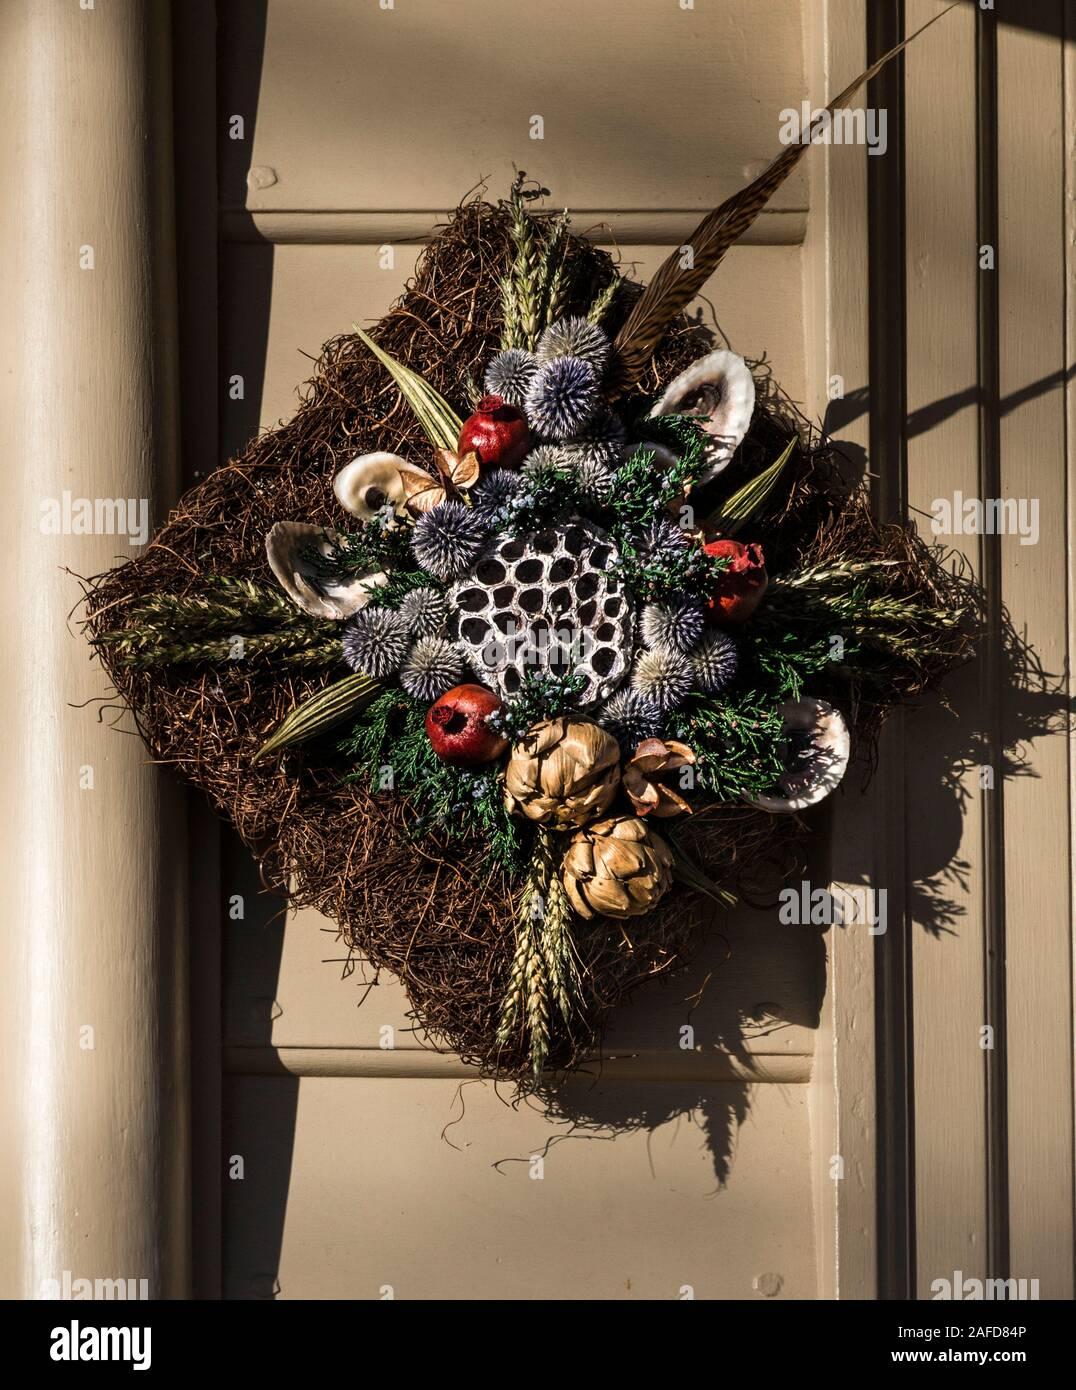 Decorazioni Per La Casa Bacche Vegetali Bacche Rosse Di Natale Deco Rami Con Bacche Rosse Rami Autunnali Ghirlanda Di Ghirlanda Di Abete Rosso Luci Ghirlanda Di Natale Bacche Per Il Decro Di Natale